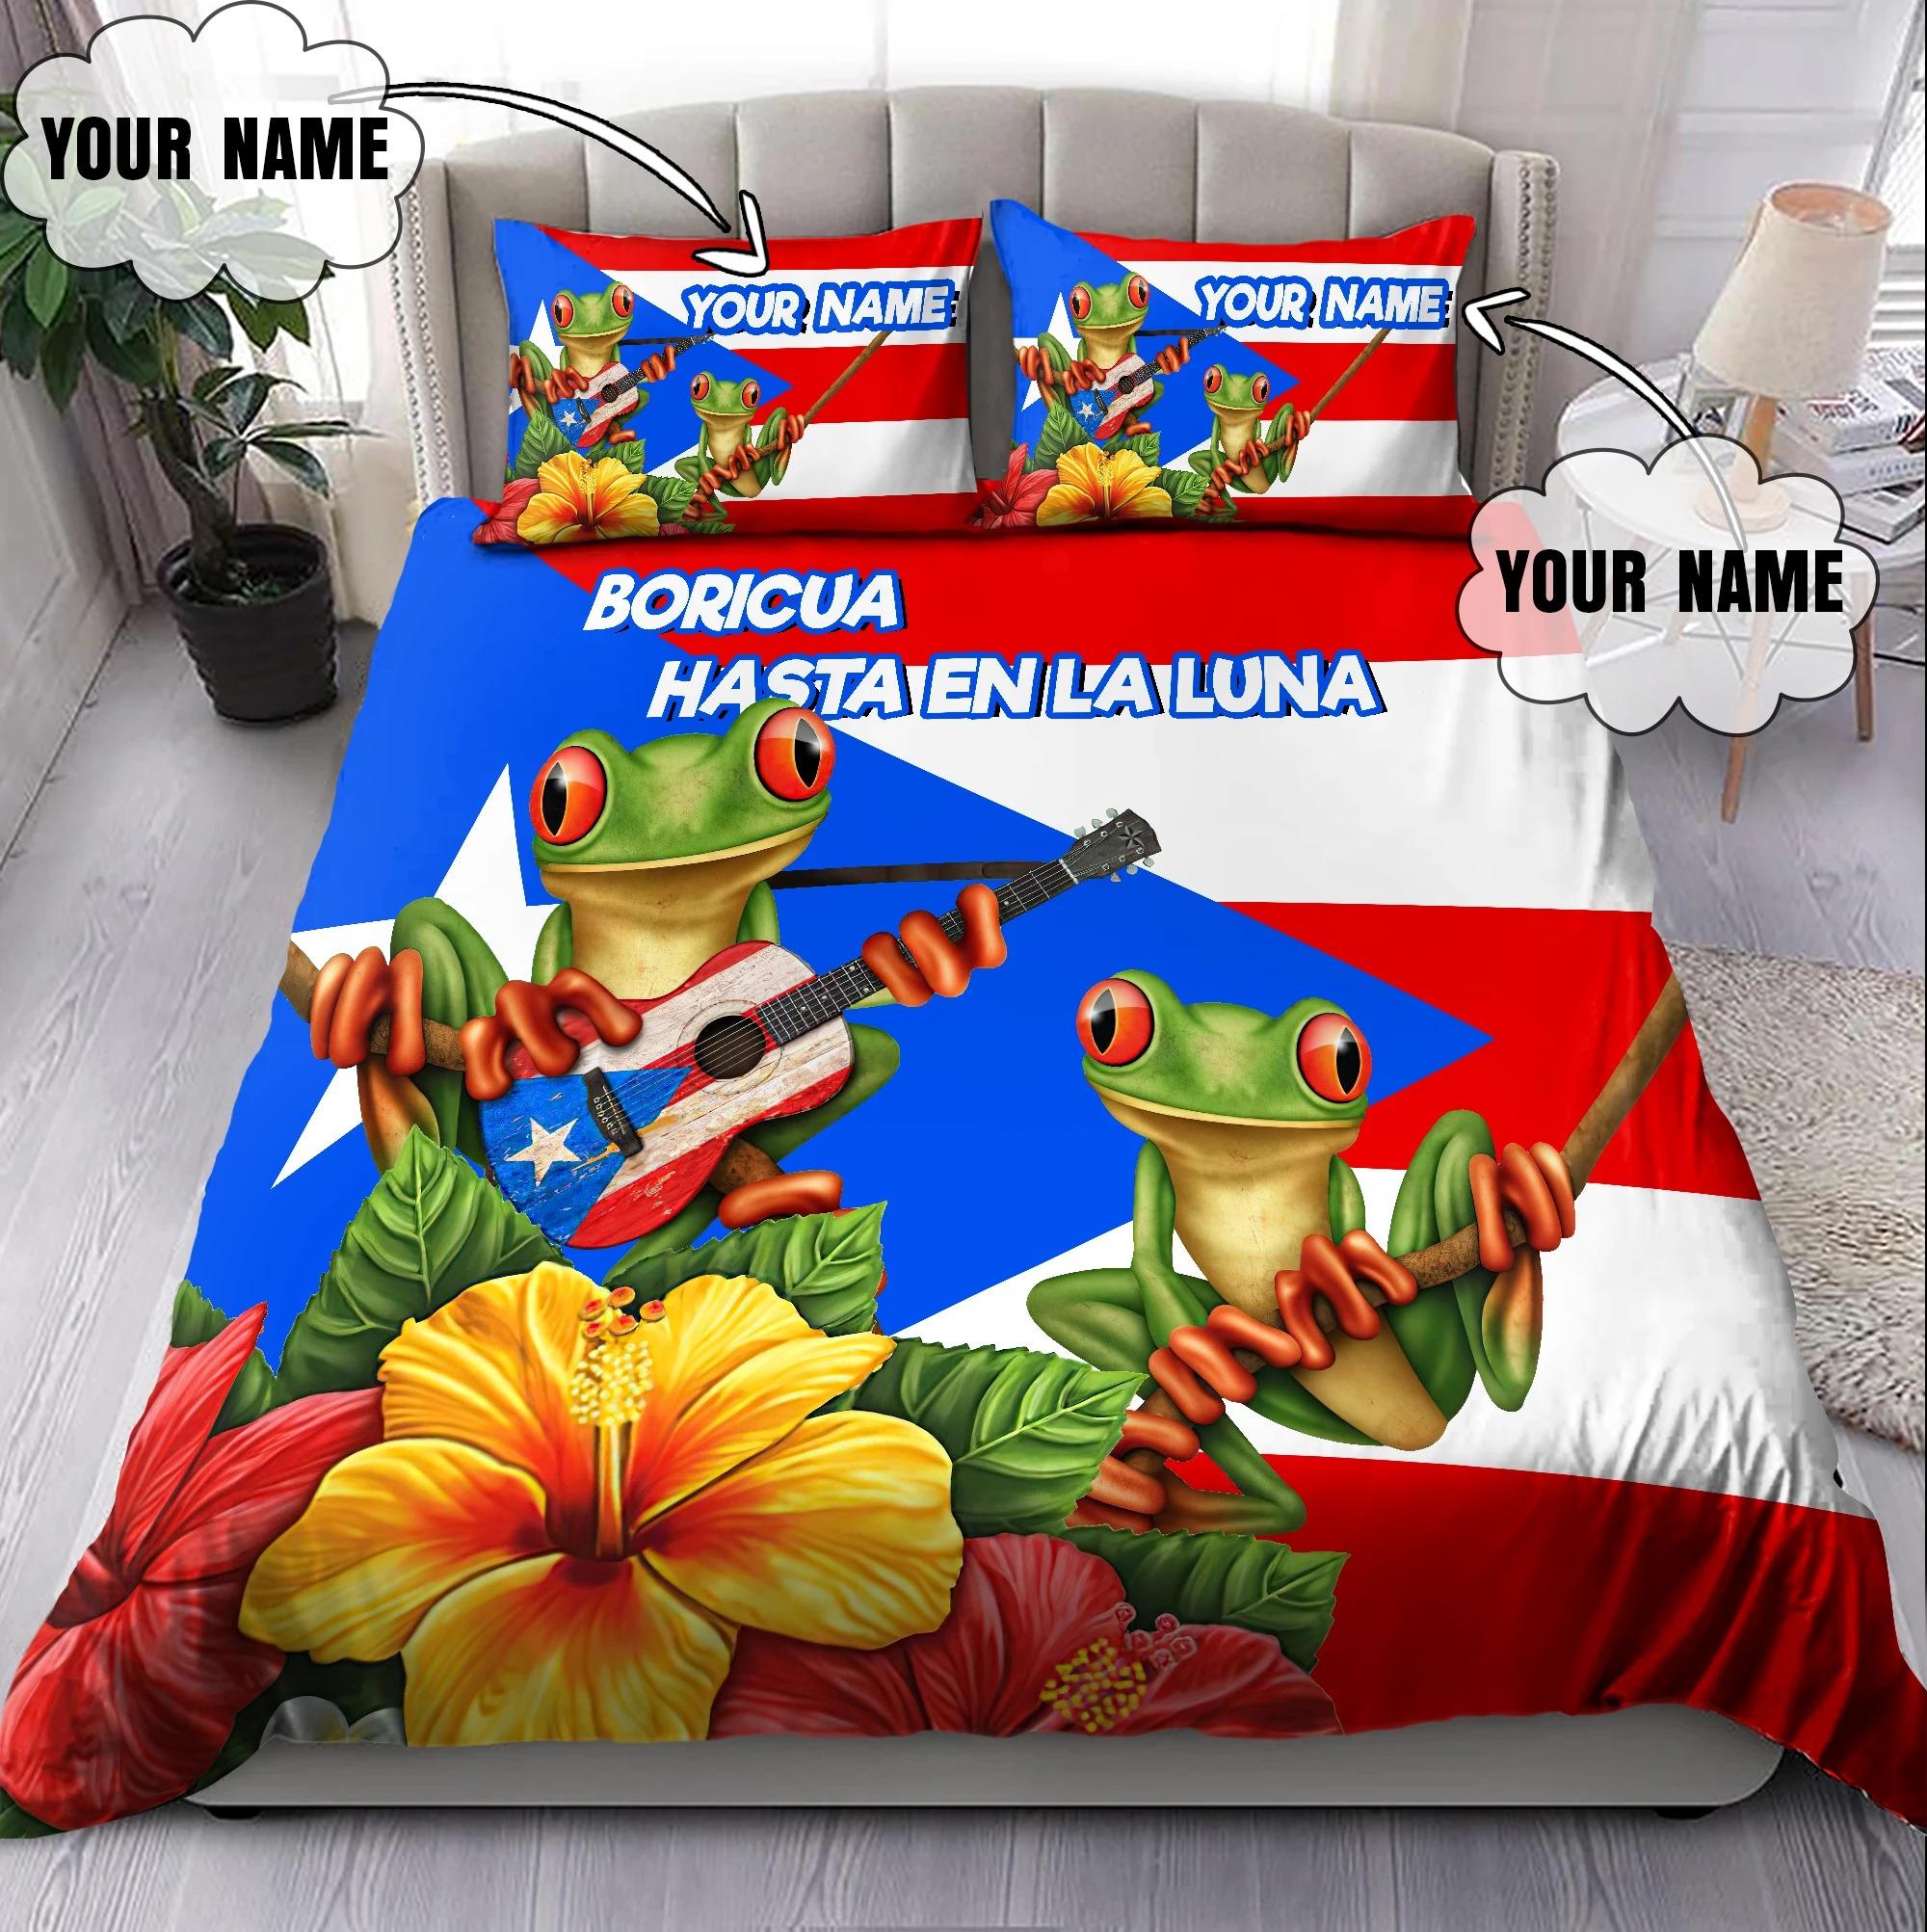 Puerto rico boricua hasta enla luna custom name bedding set4